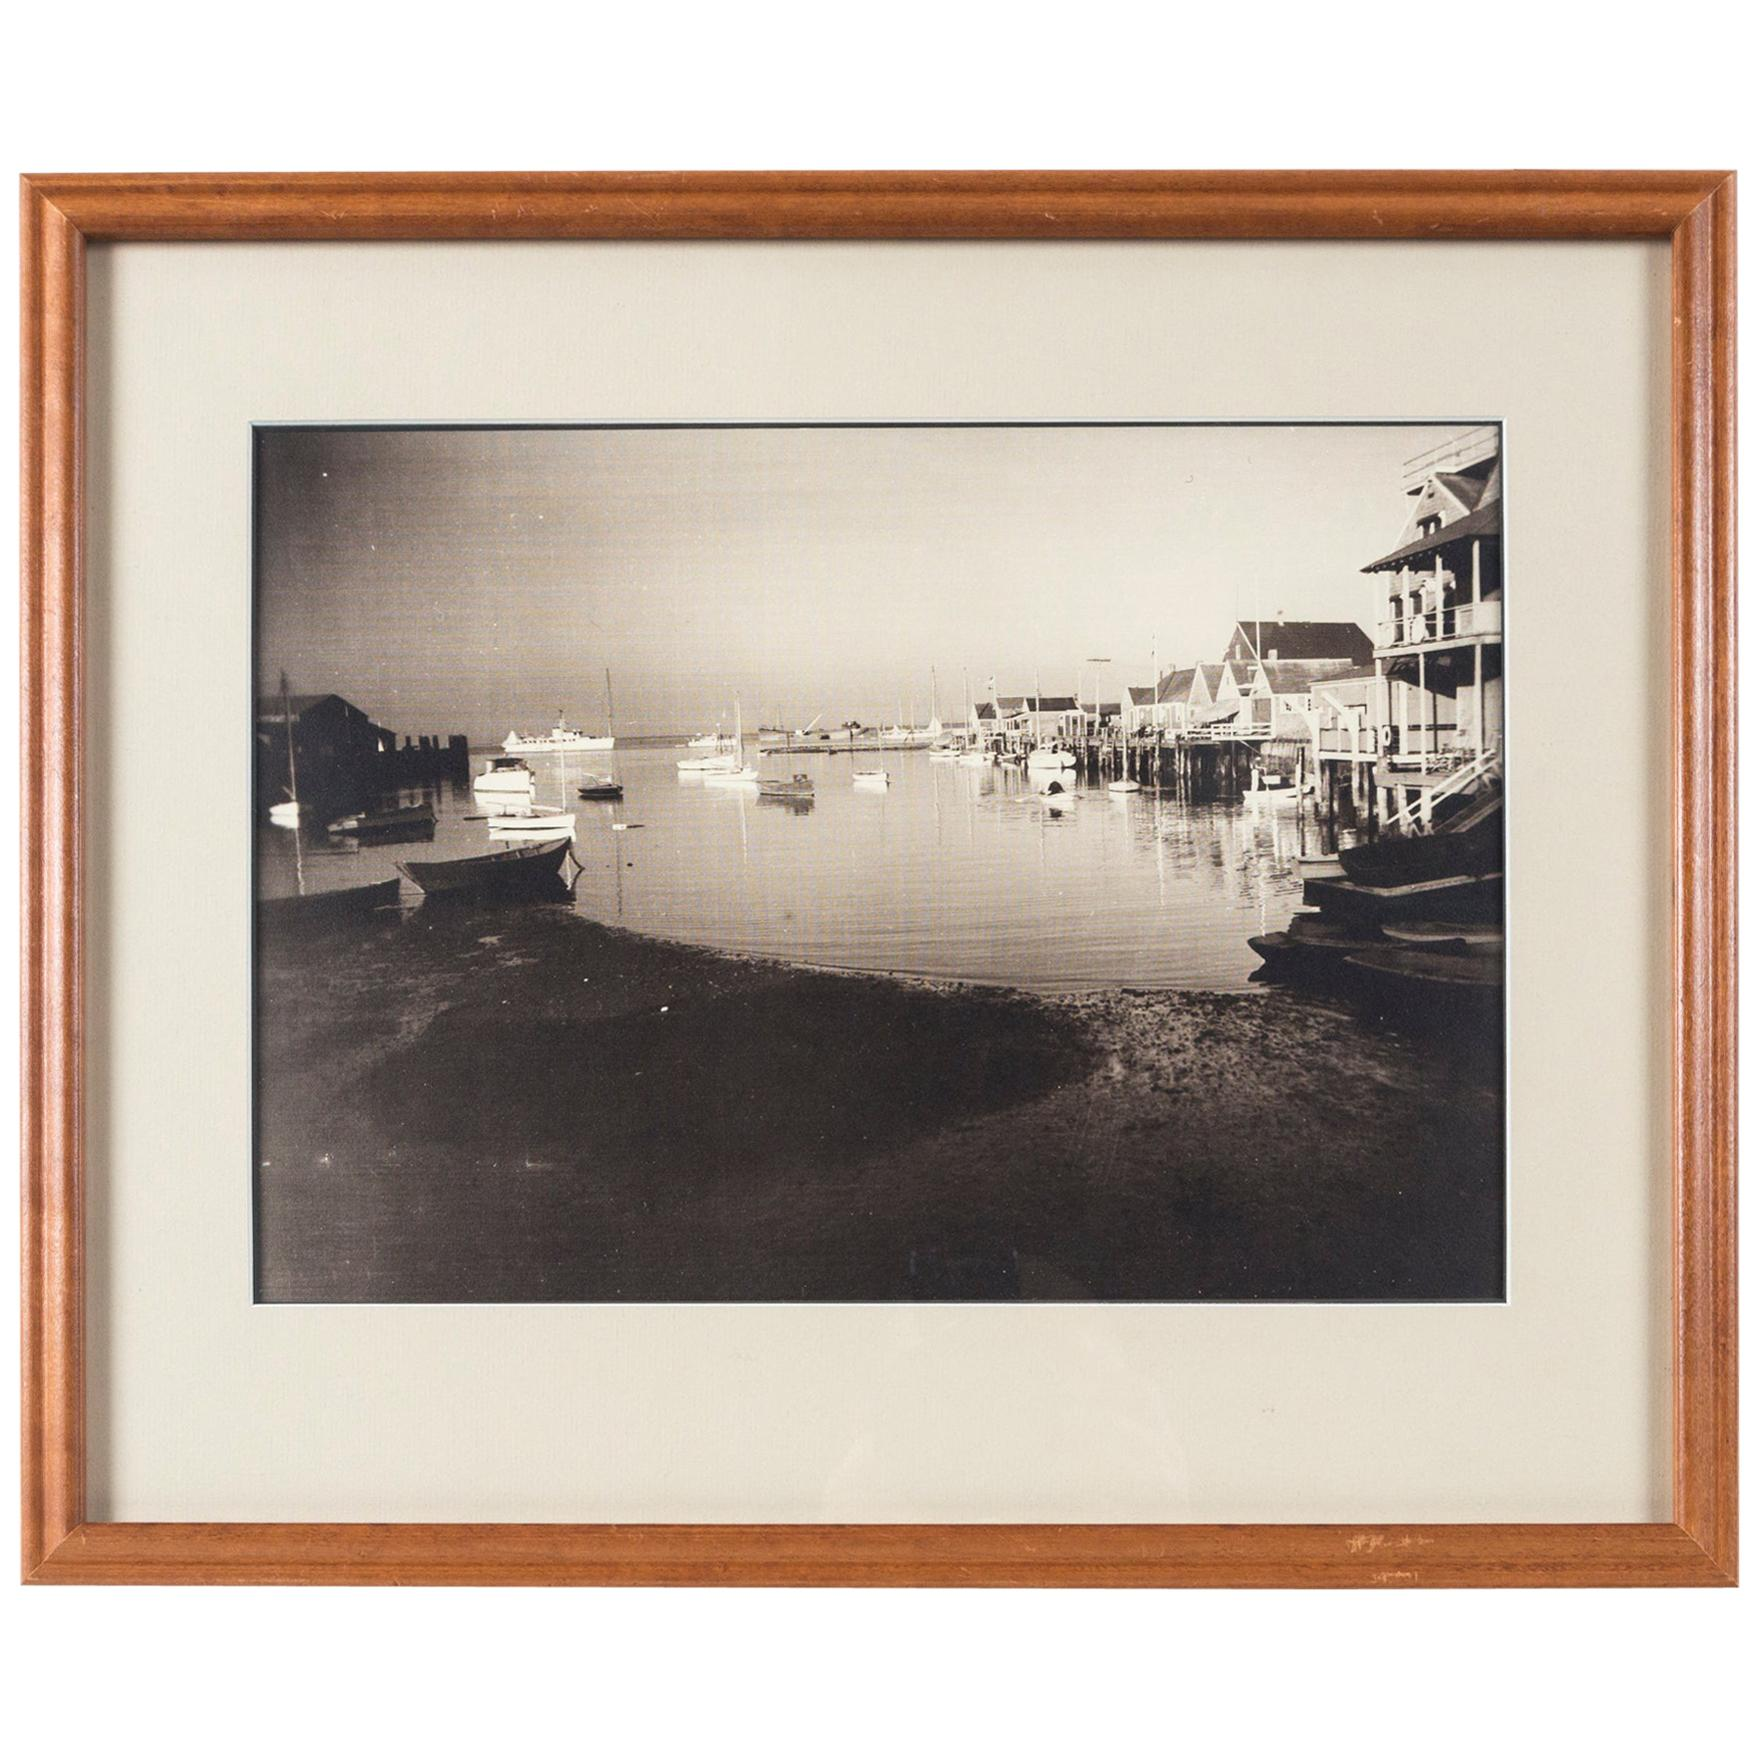 Vintage Black & White Photograph, Nantucket Harbor, James F. Barker, circa 1935